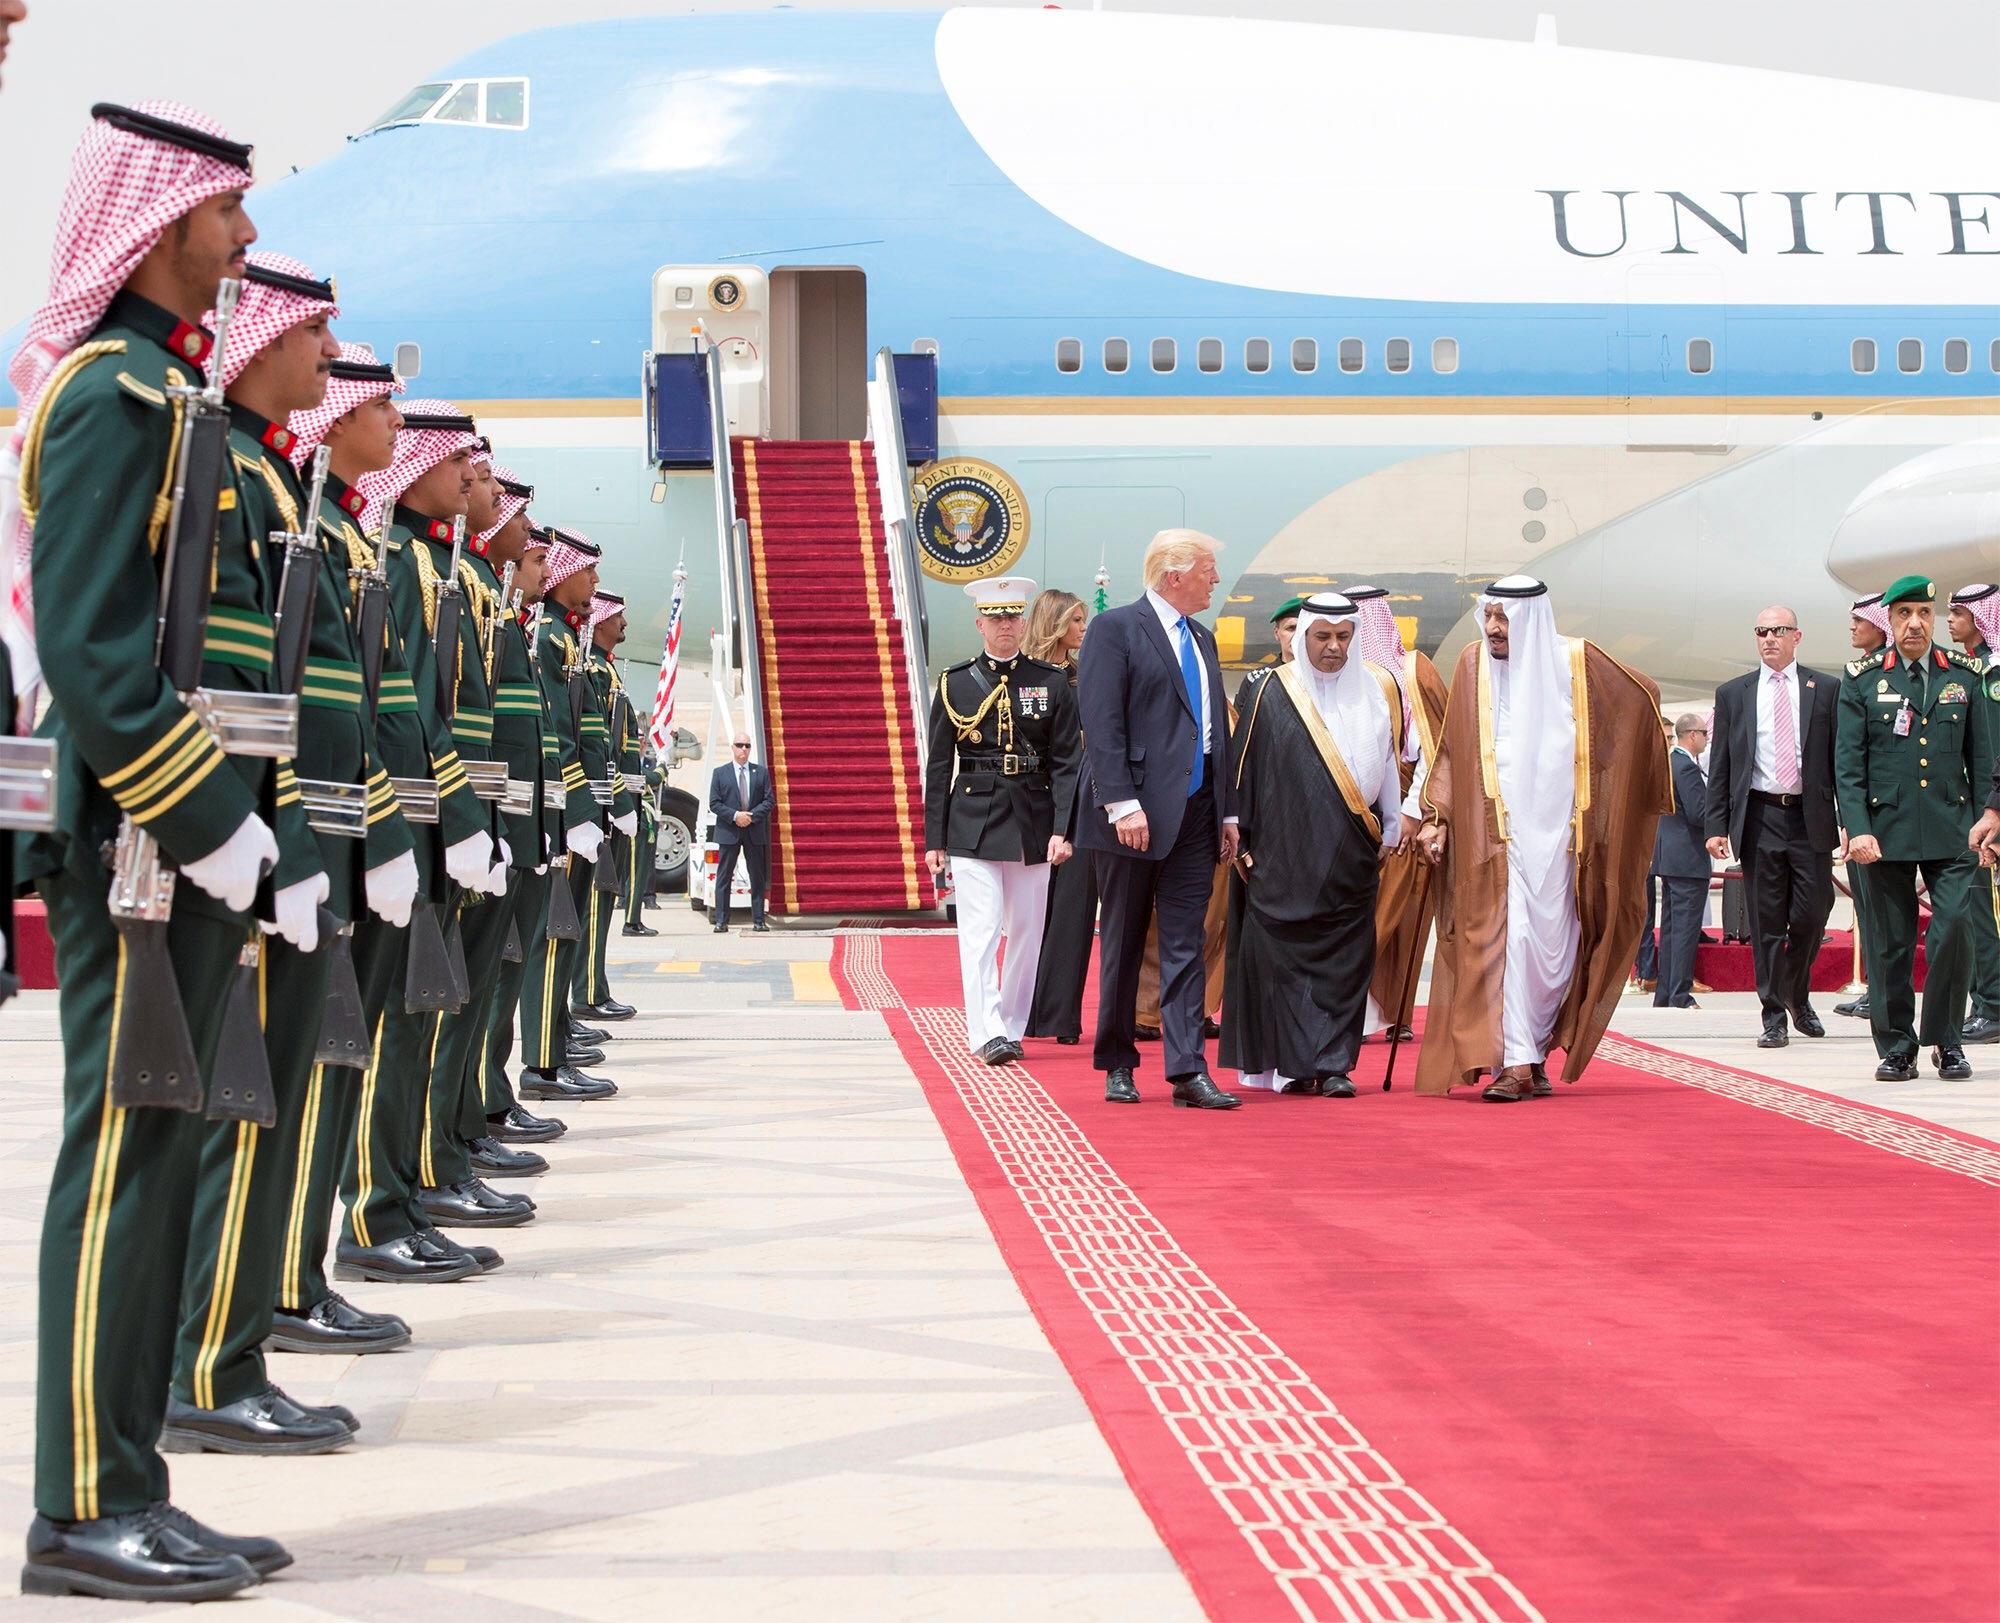 Saudi Arabia's King Salman bin Abdulaziz Al Saud and U.S. President Donald Trump walk during a reception ceremony in Riyadh, Saudi Arabia, May 20, 2017.Bandar Algaloud/Courtesy of Saudi Royal Court/Handout via REUTERS